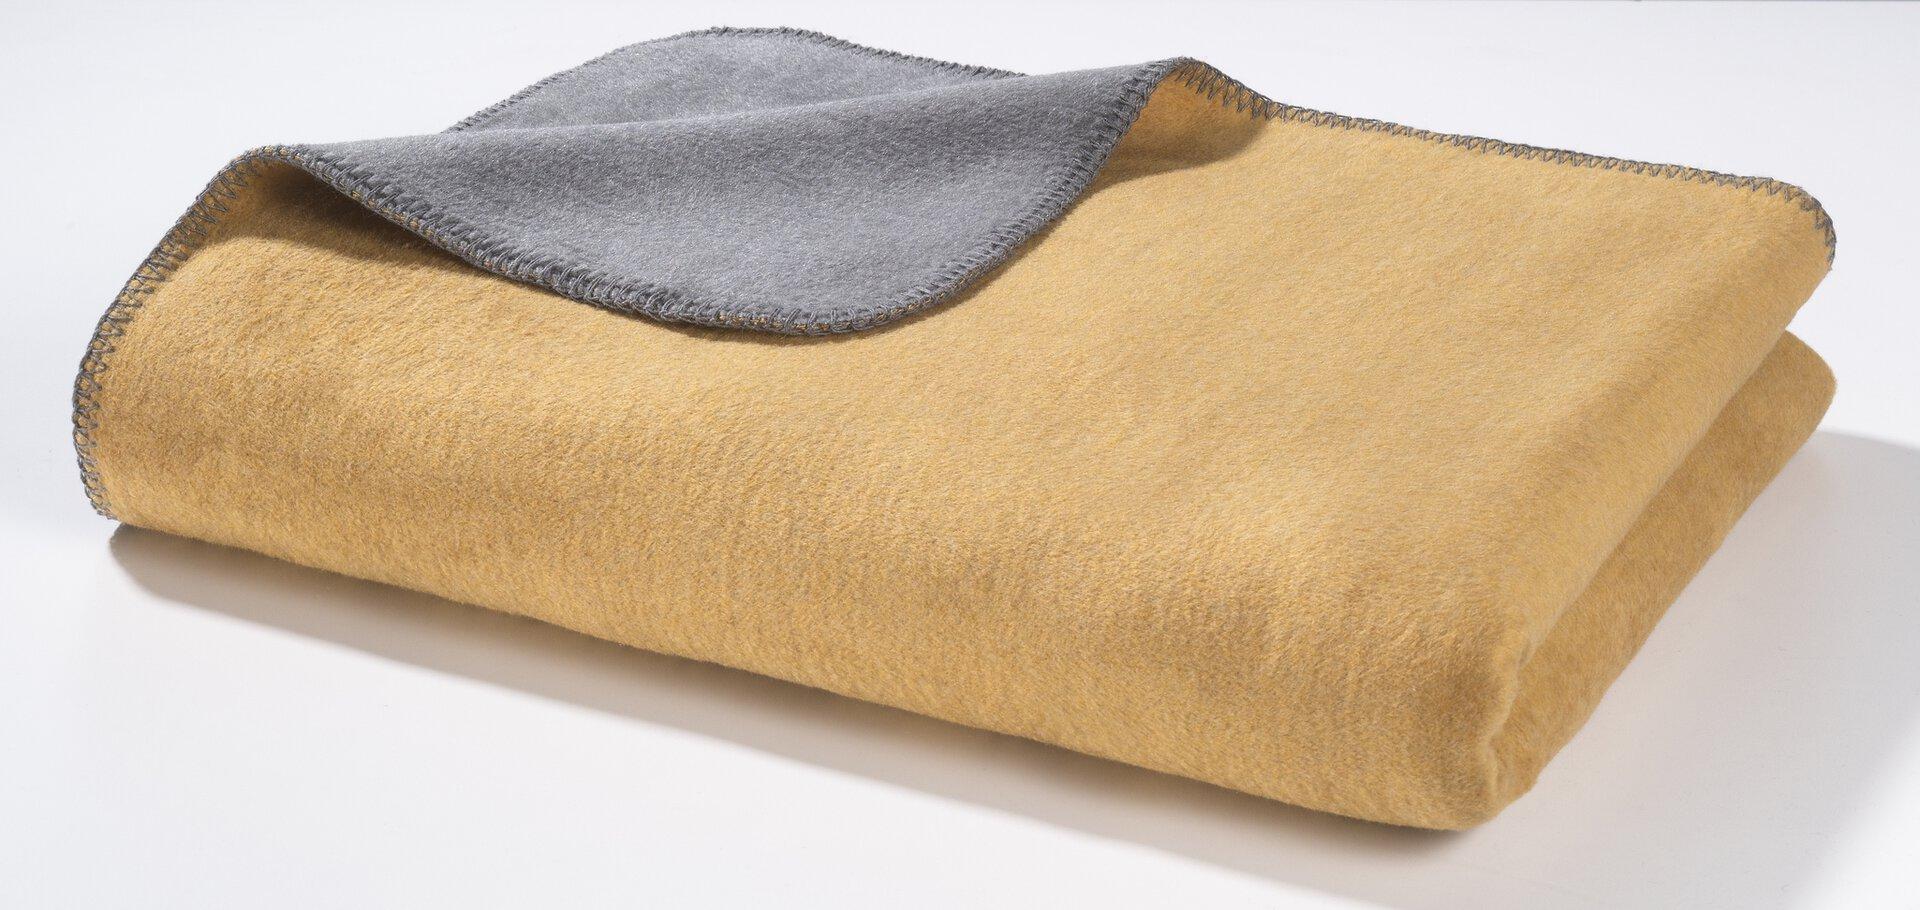 Wendedecke Casa Nova Textil gold 150 x 200 cm